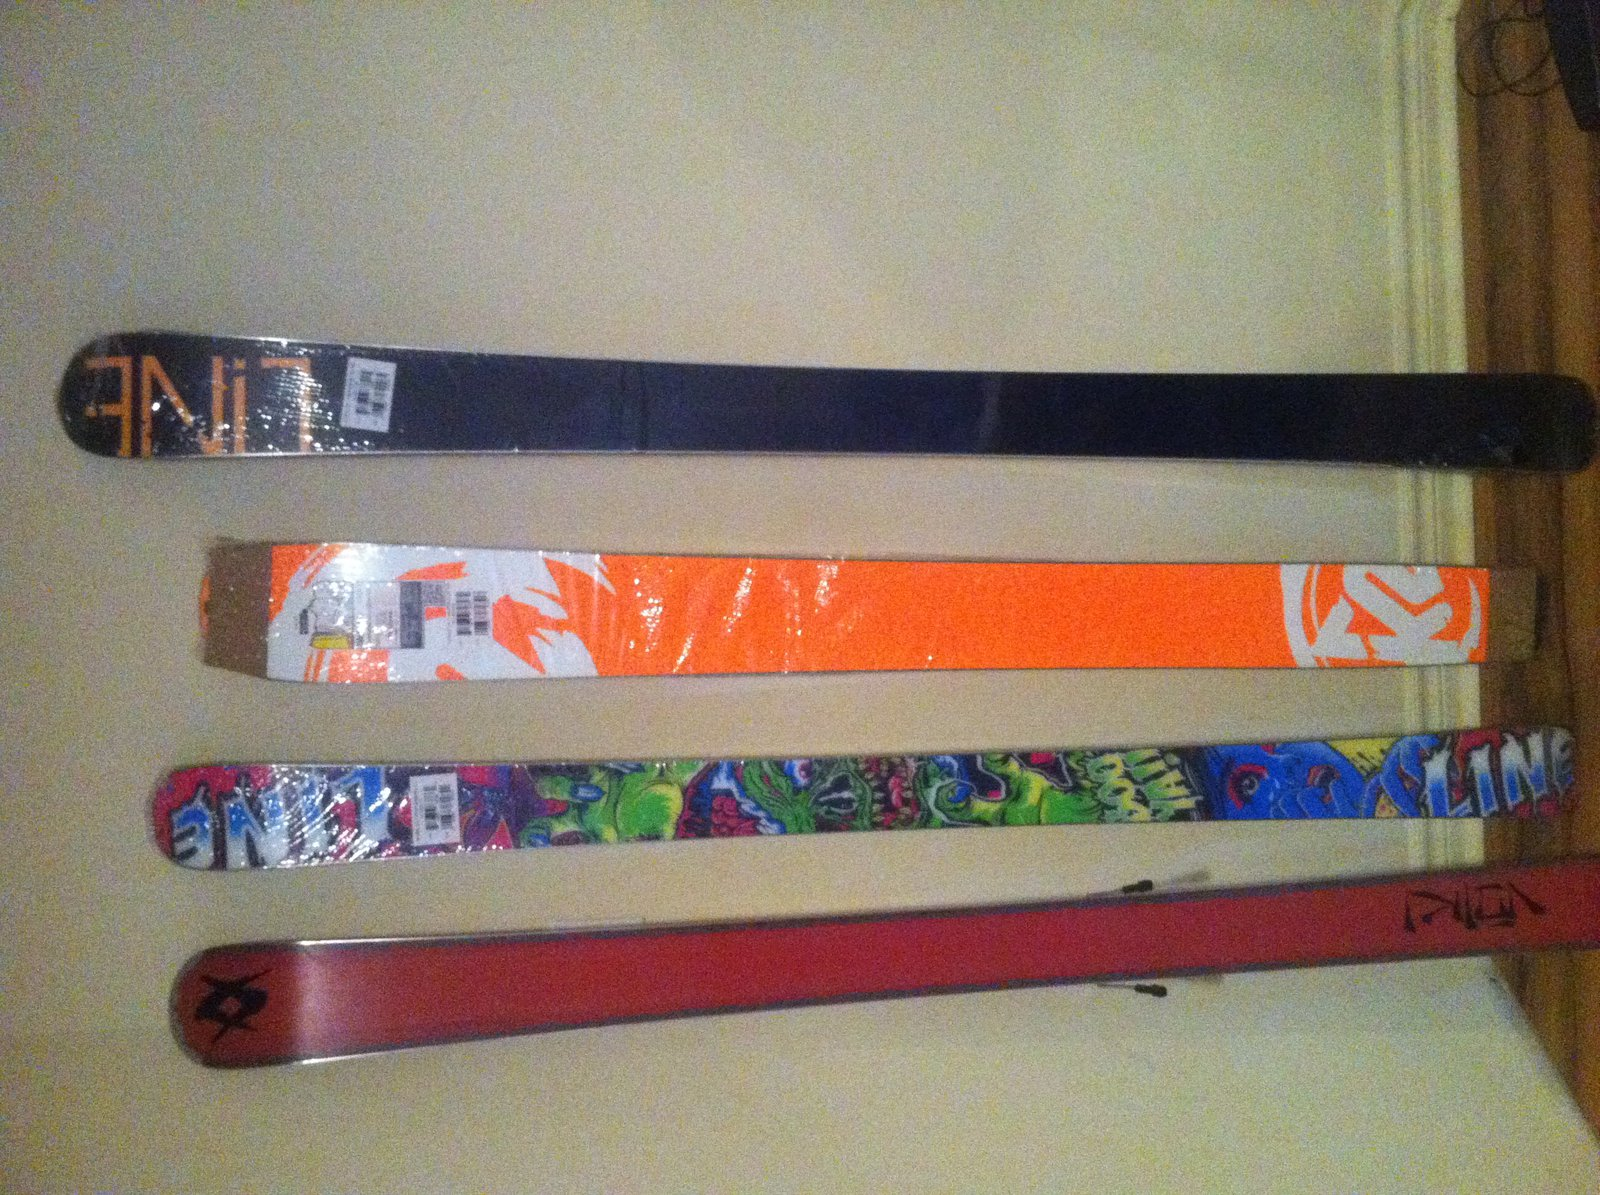 Skis for sale bottom